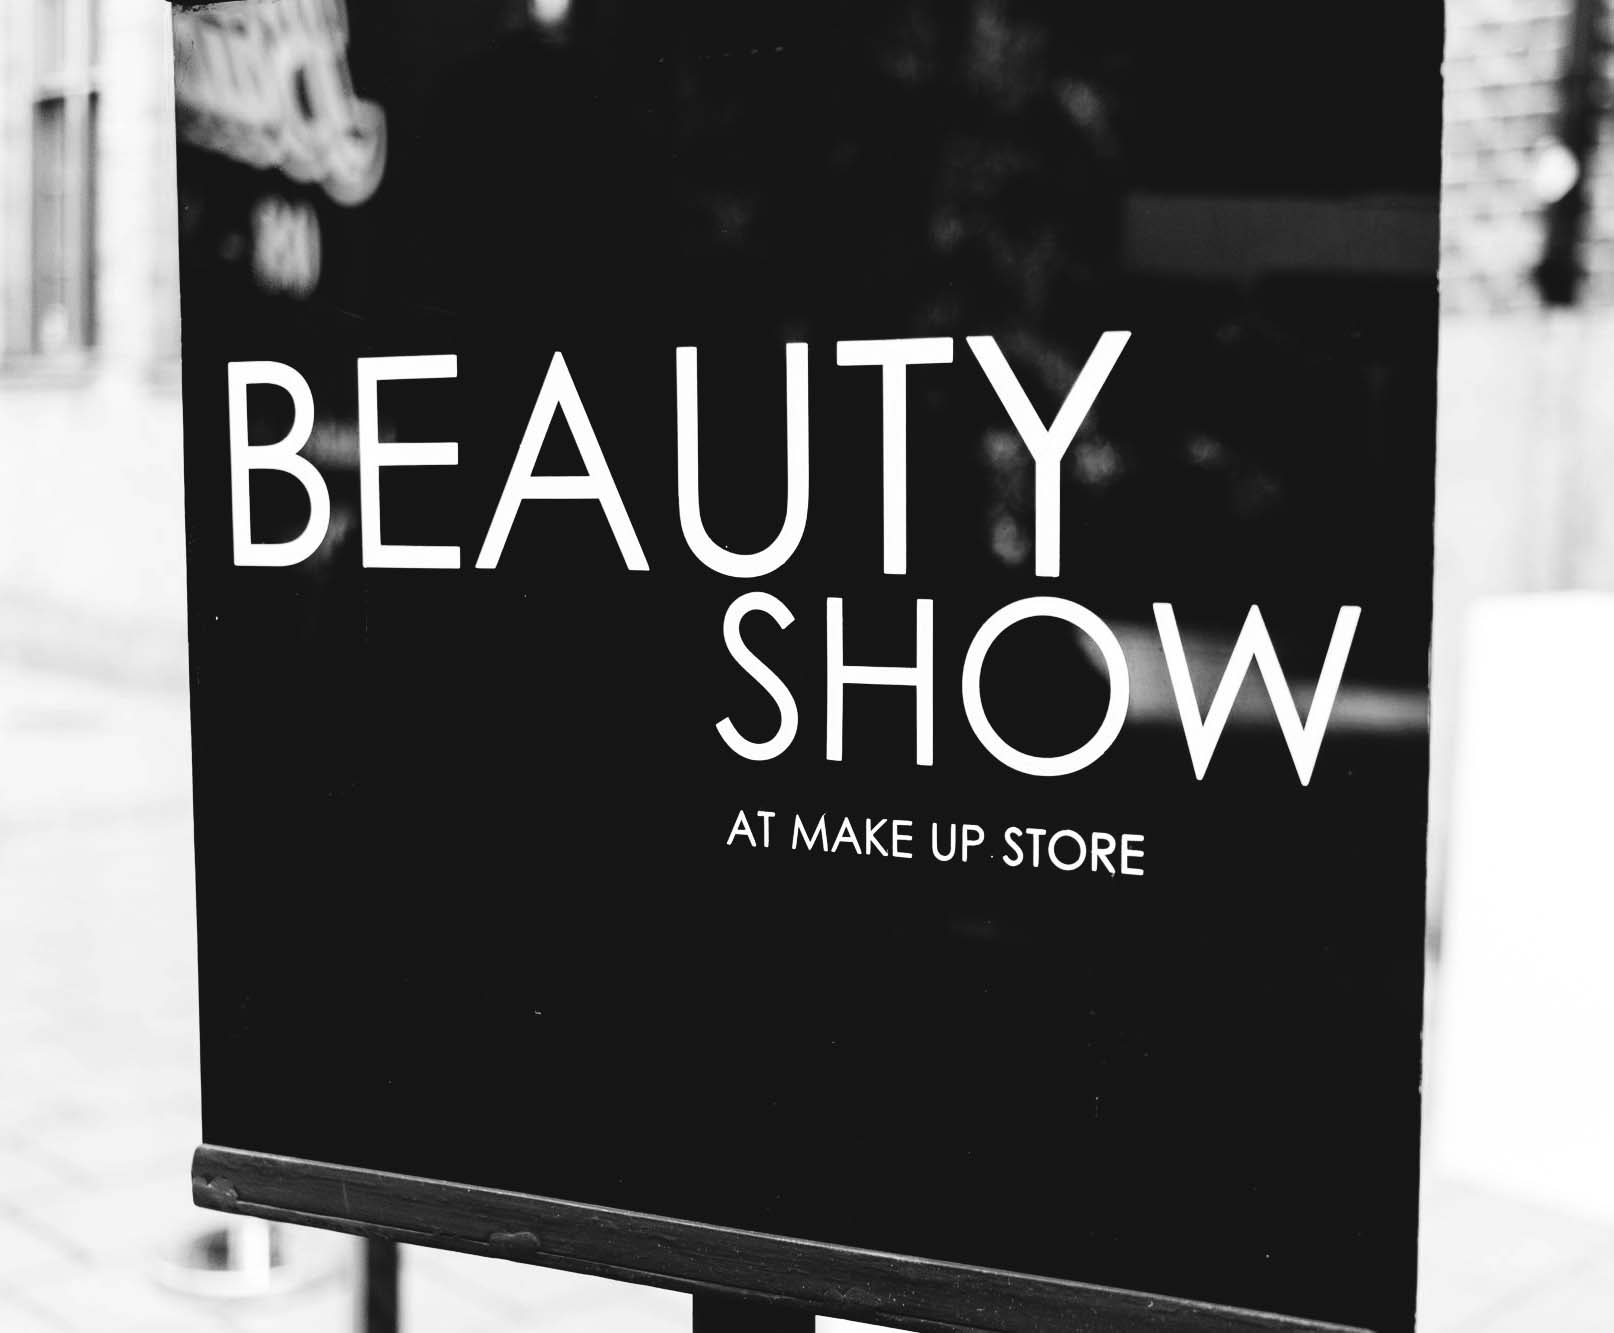 makeupstorebeautyshow